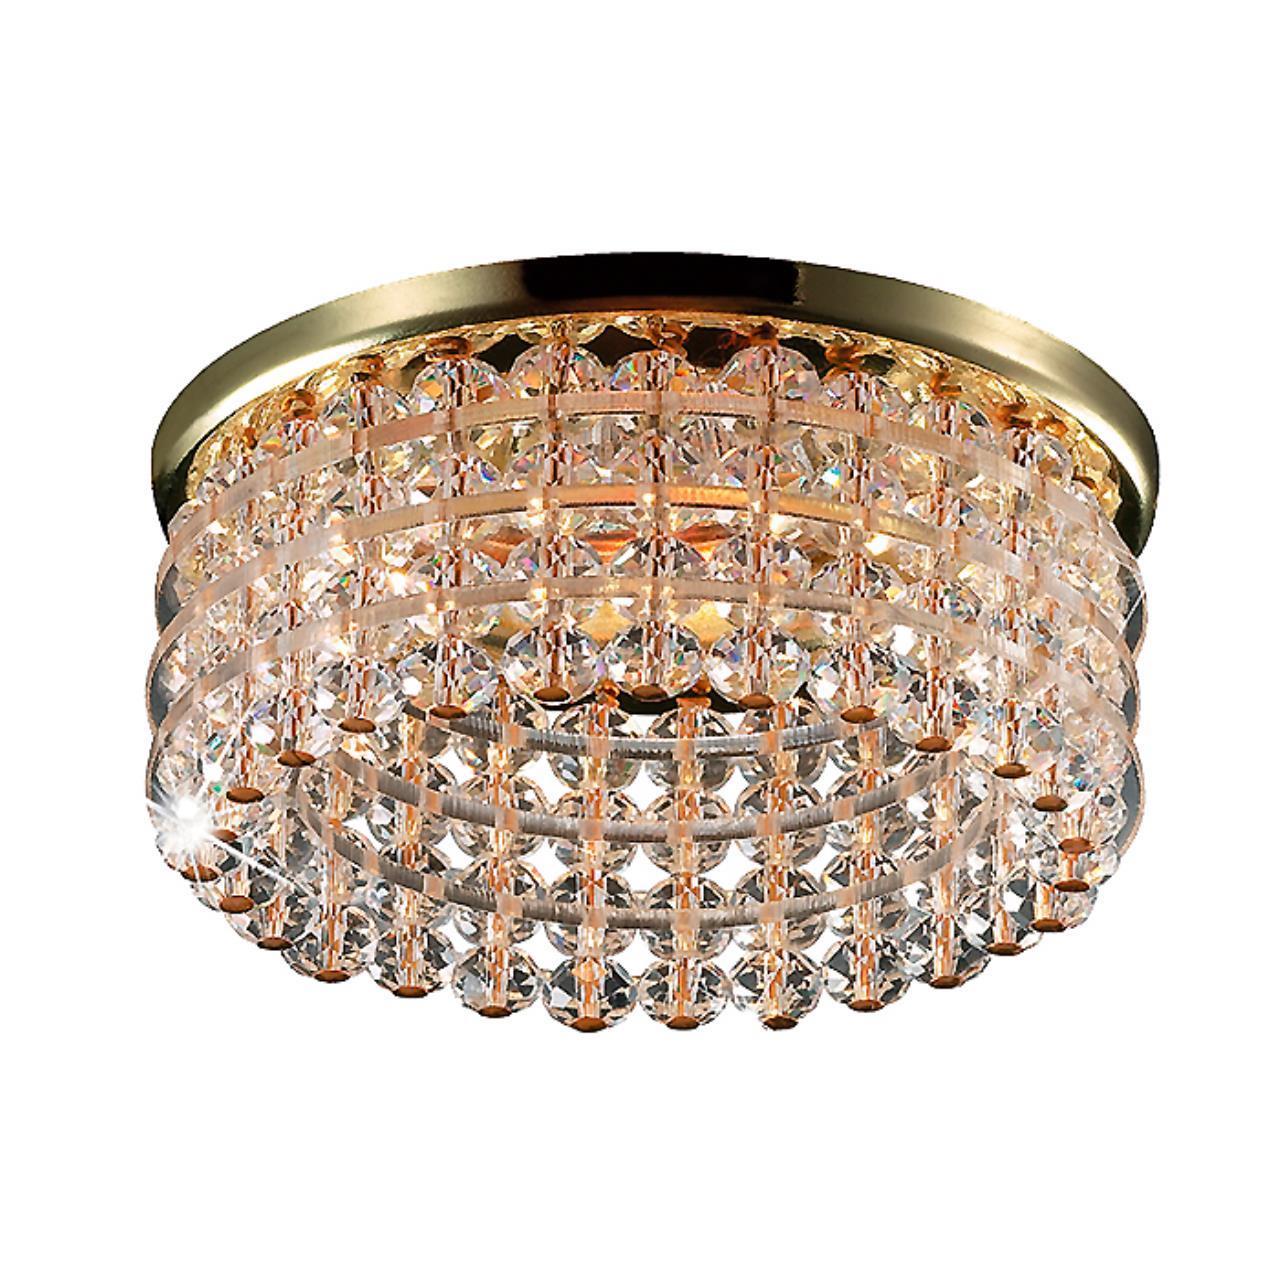 369442 SPOT NT09 122 золото/прозрачный Встраиваемый  светильник GX5.3 50W 12V PEARL ROUND